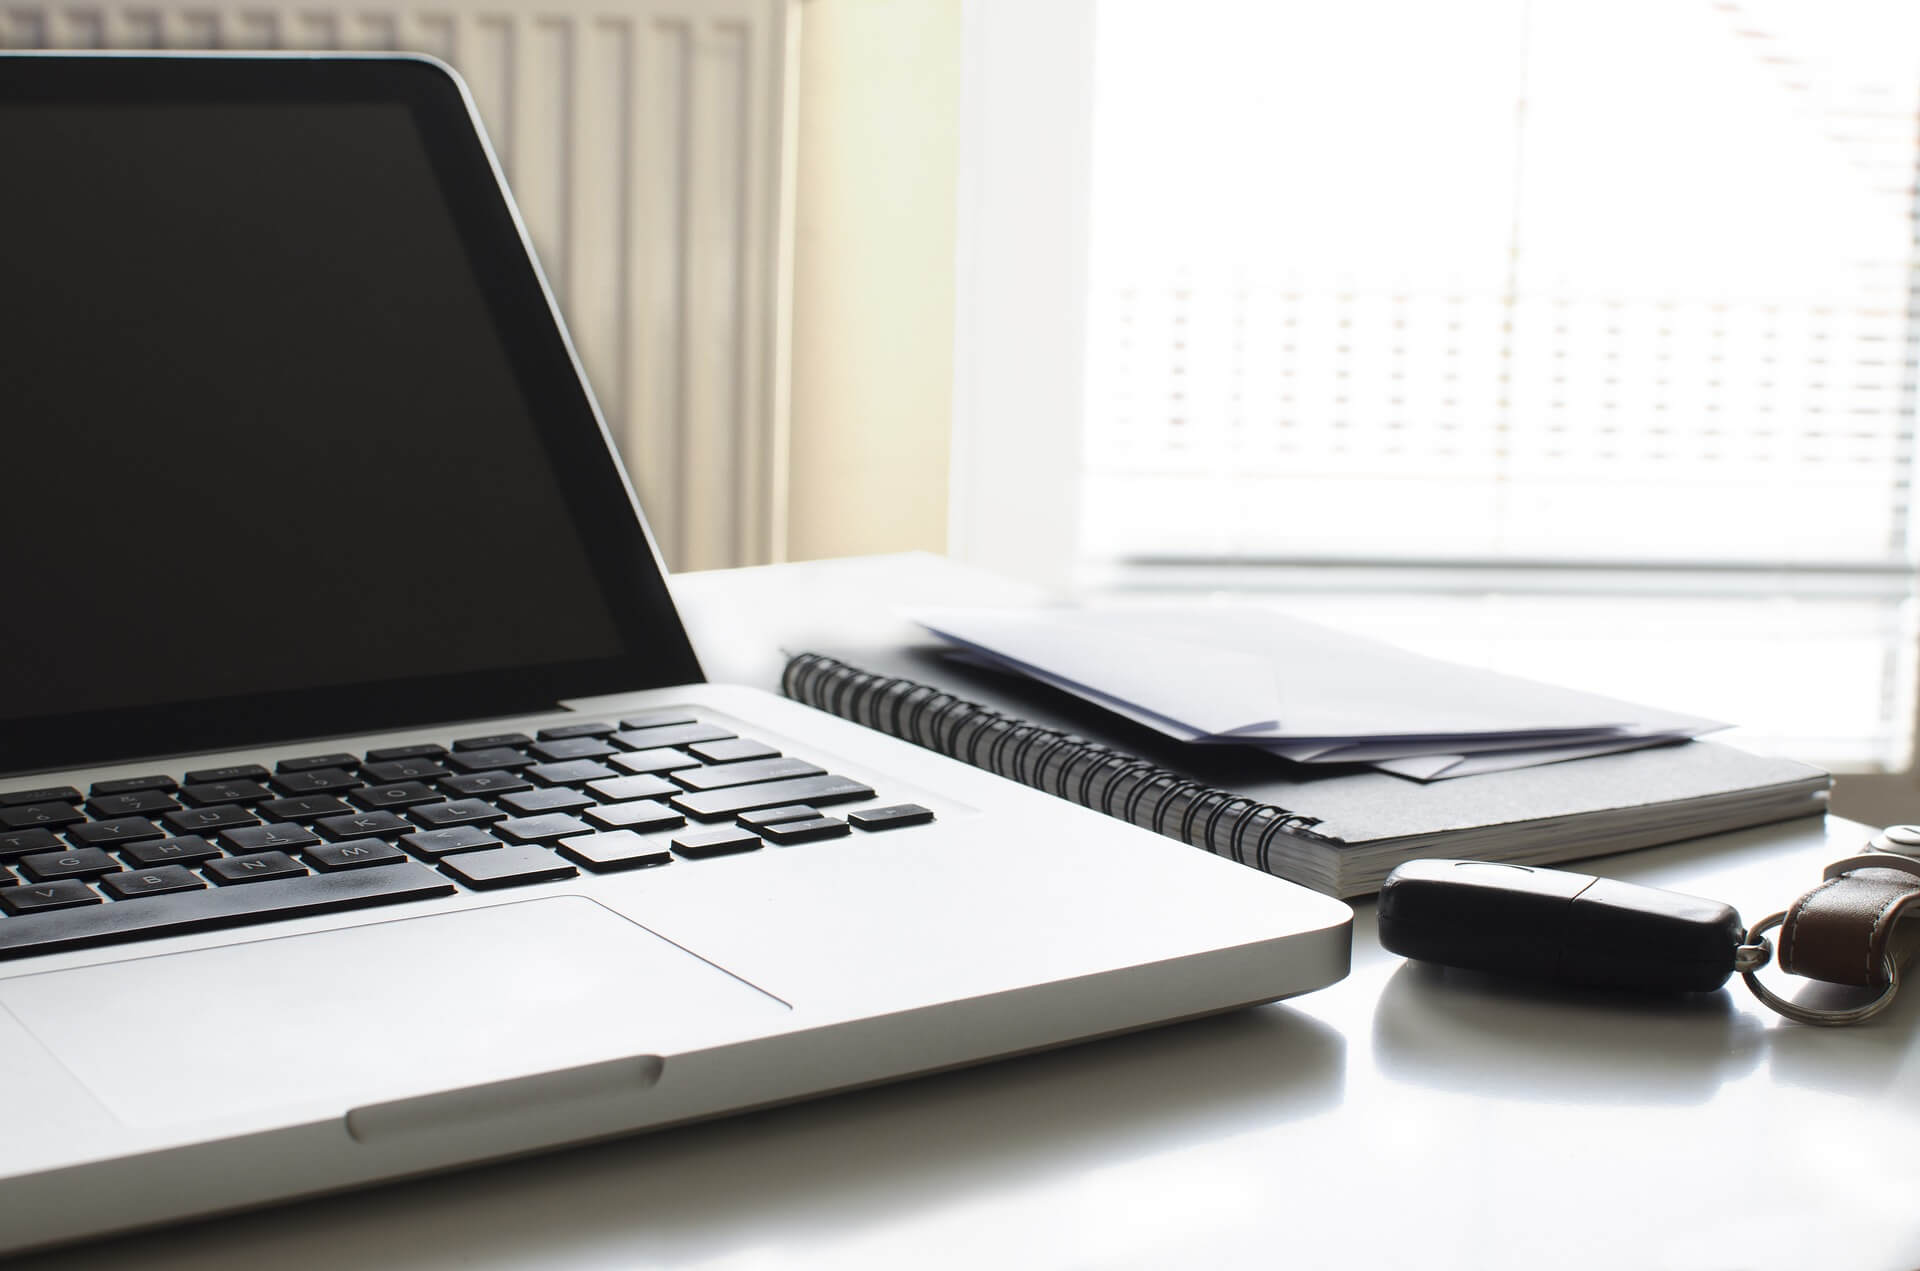 License Plate Reader On Windows PC